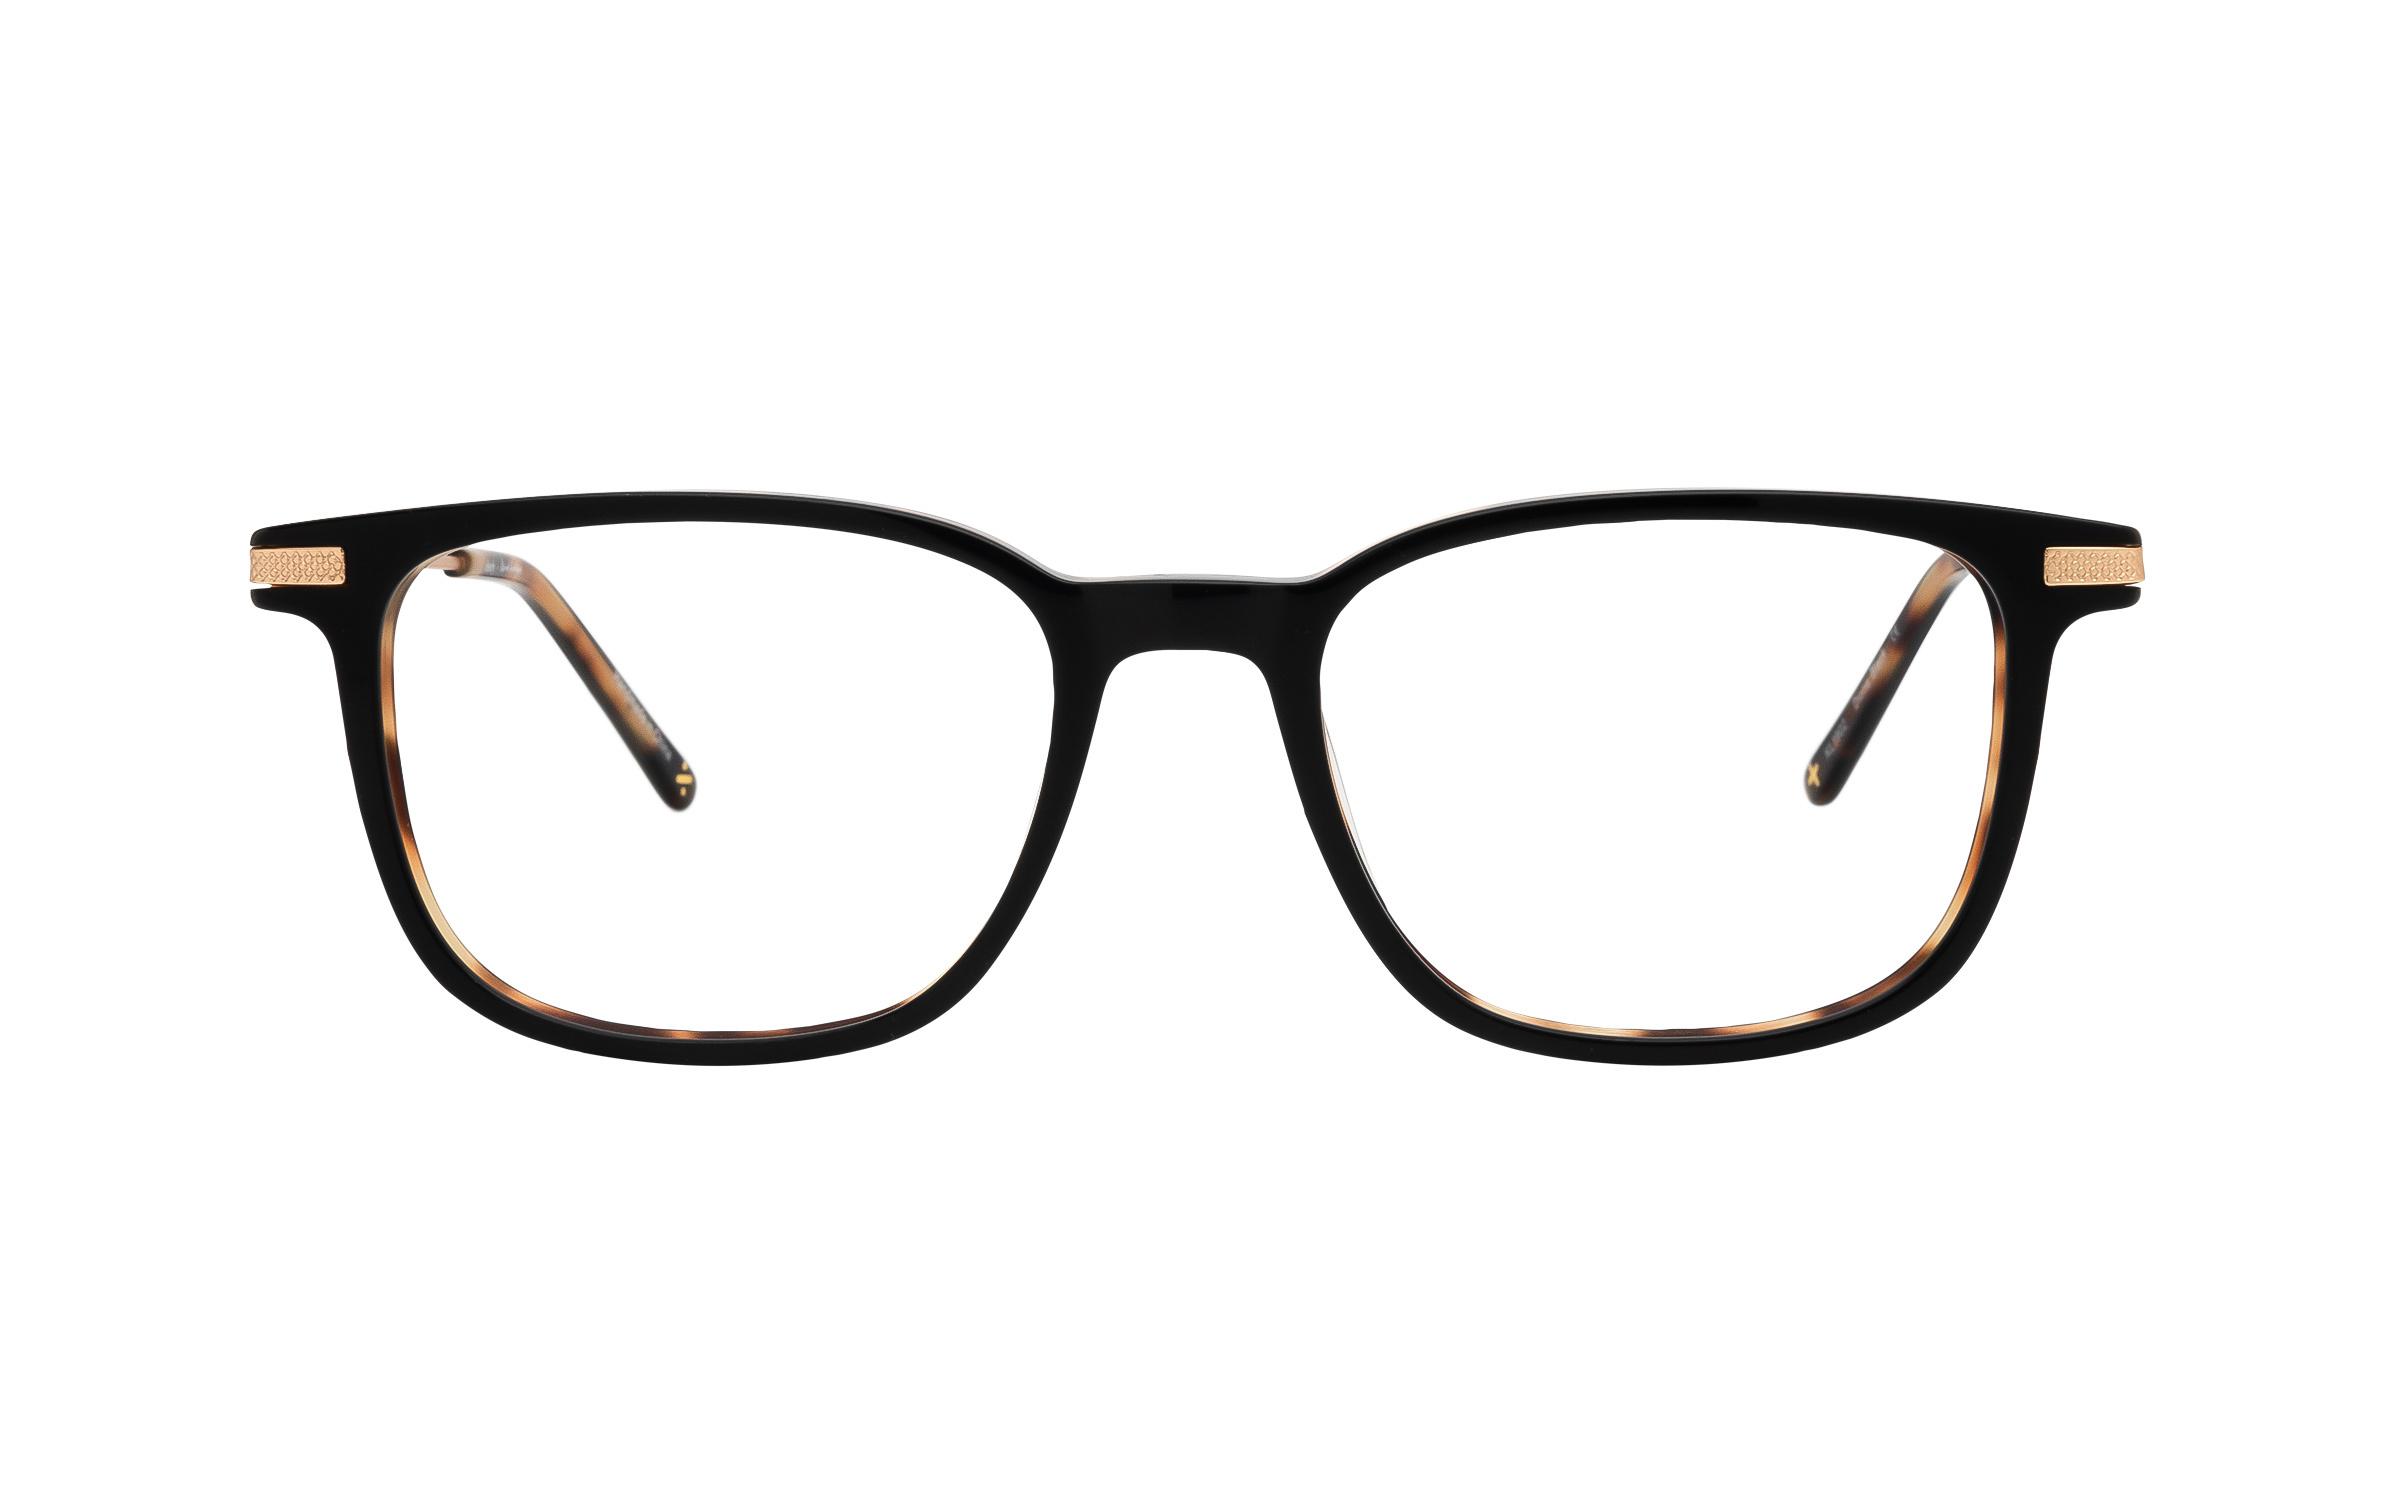 coastal.com - Derek Cardigan Dione (52) Eyeglasses and Frame in Black | Acetate/Metal – Online Coastal 55.00 USD